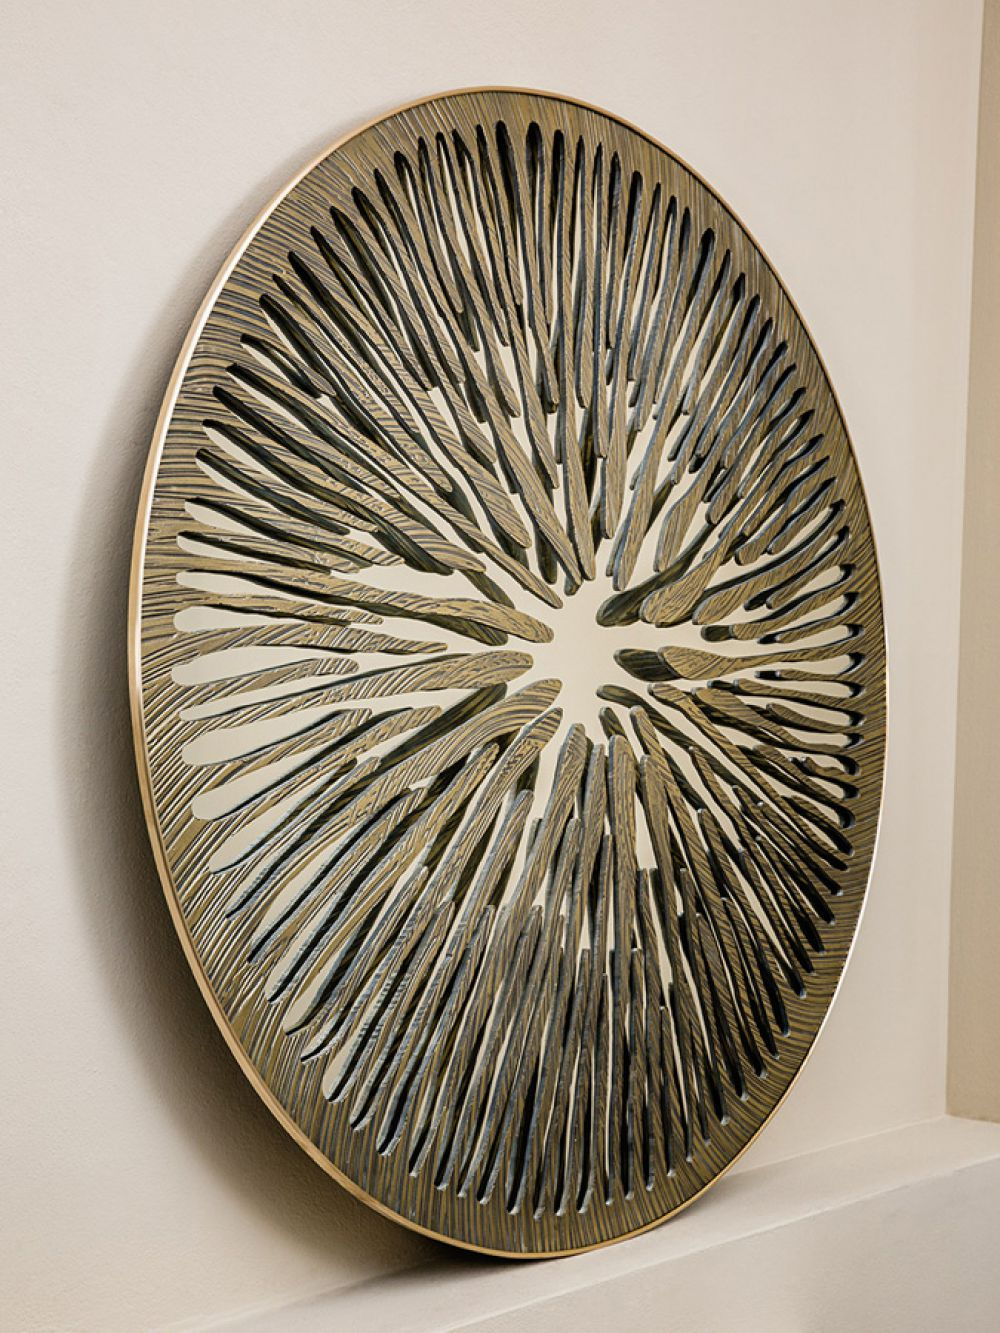 PUPIL VIII - Sculptural mirror : Aluminum  - Liquid Bronze - Brass - Cast bronze finish